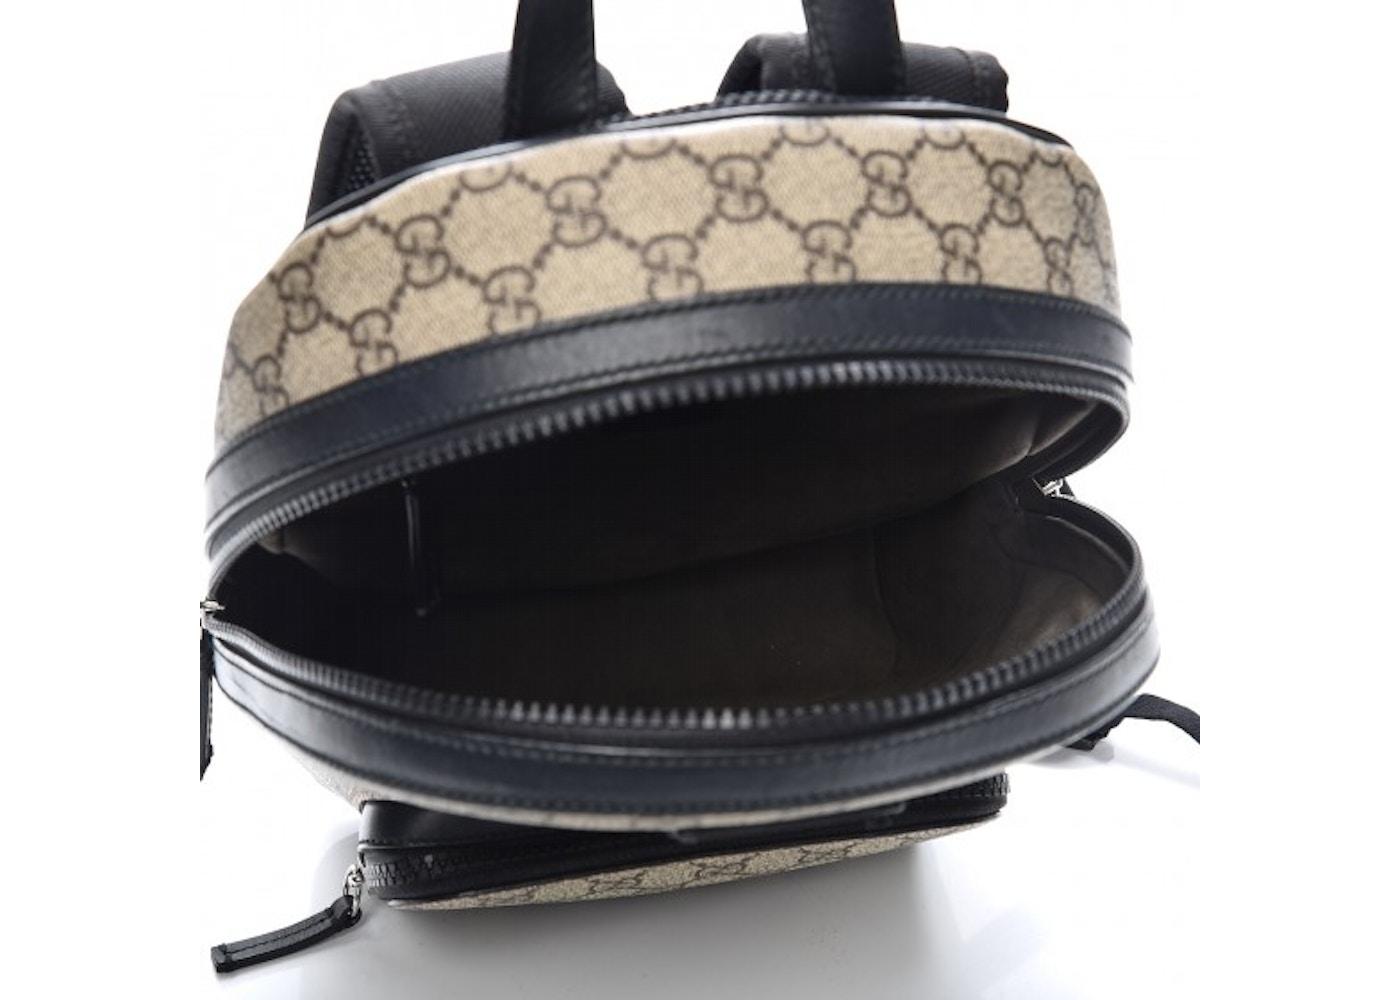 e0e6b071d1ae Gucci Front Zipper Pocket Backpack Monogram GG Supreme Beige/Black